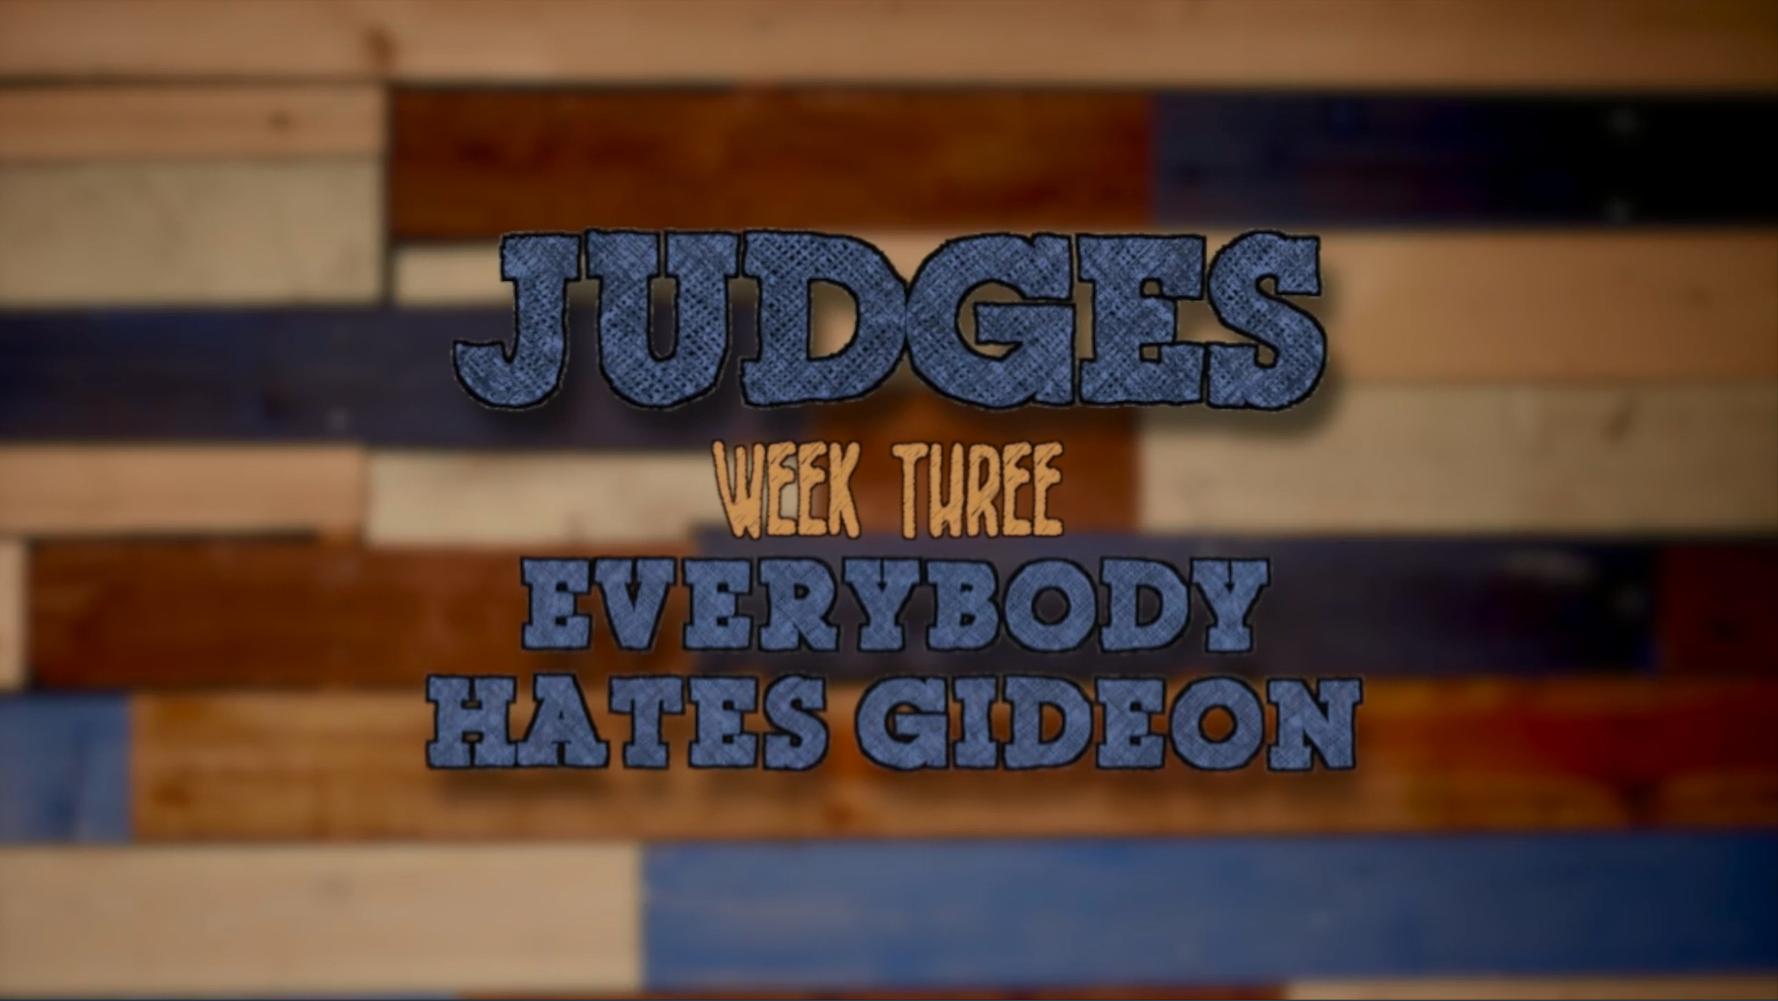 EVERYBODY HATES GIDEON